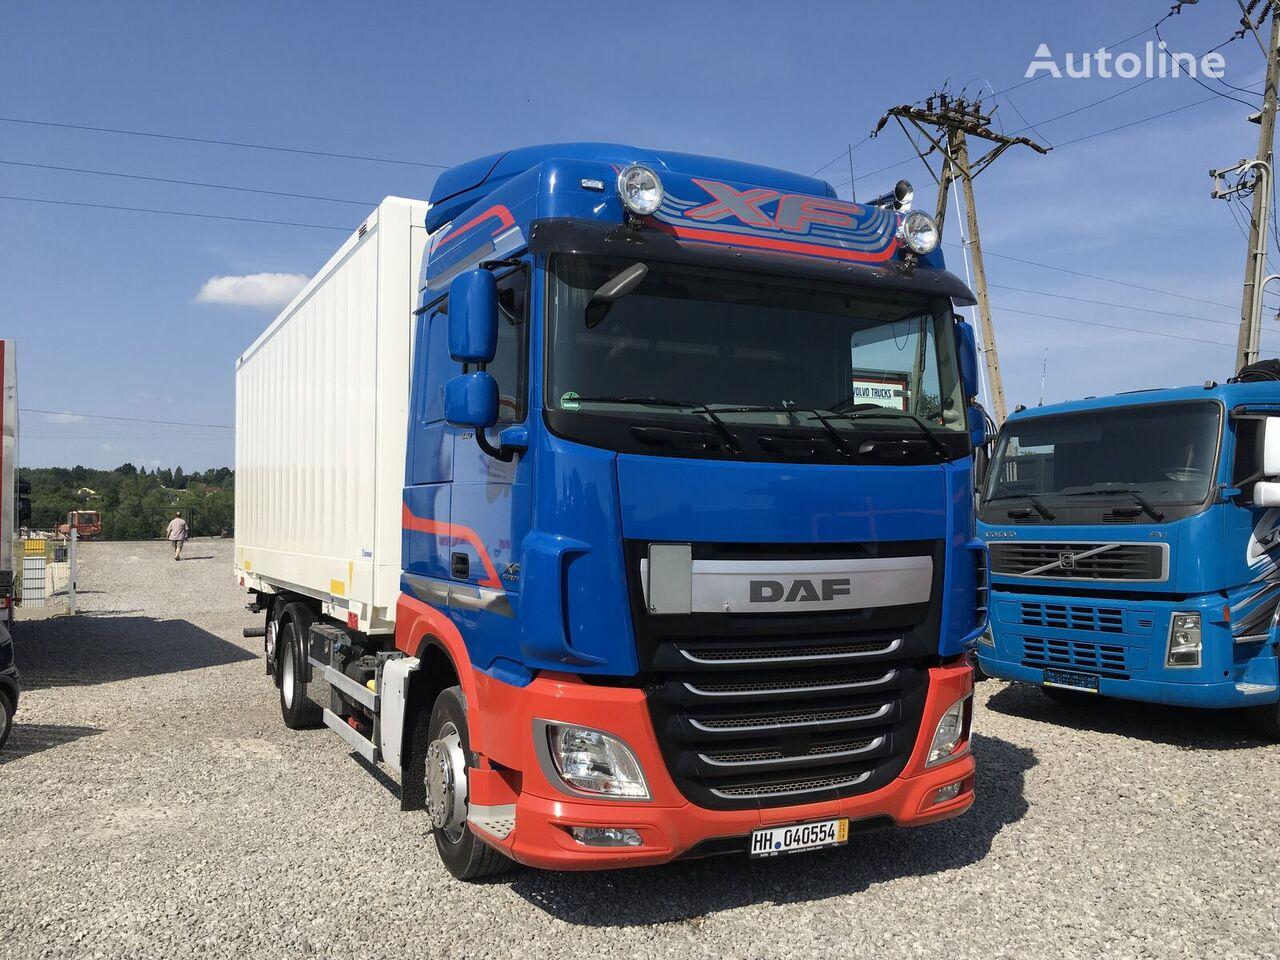 isotermiline veoauto DAF XF 106.440 E6 105 kontener 6x2 , Super stan